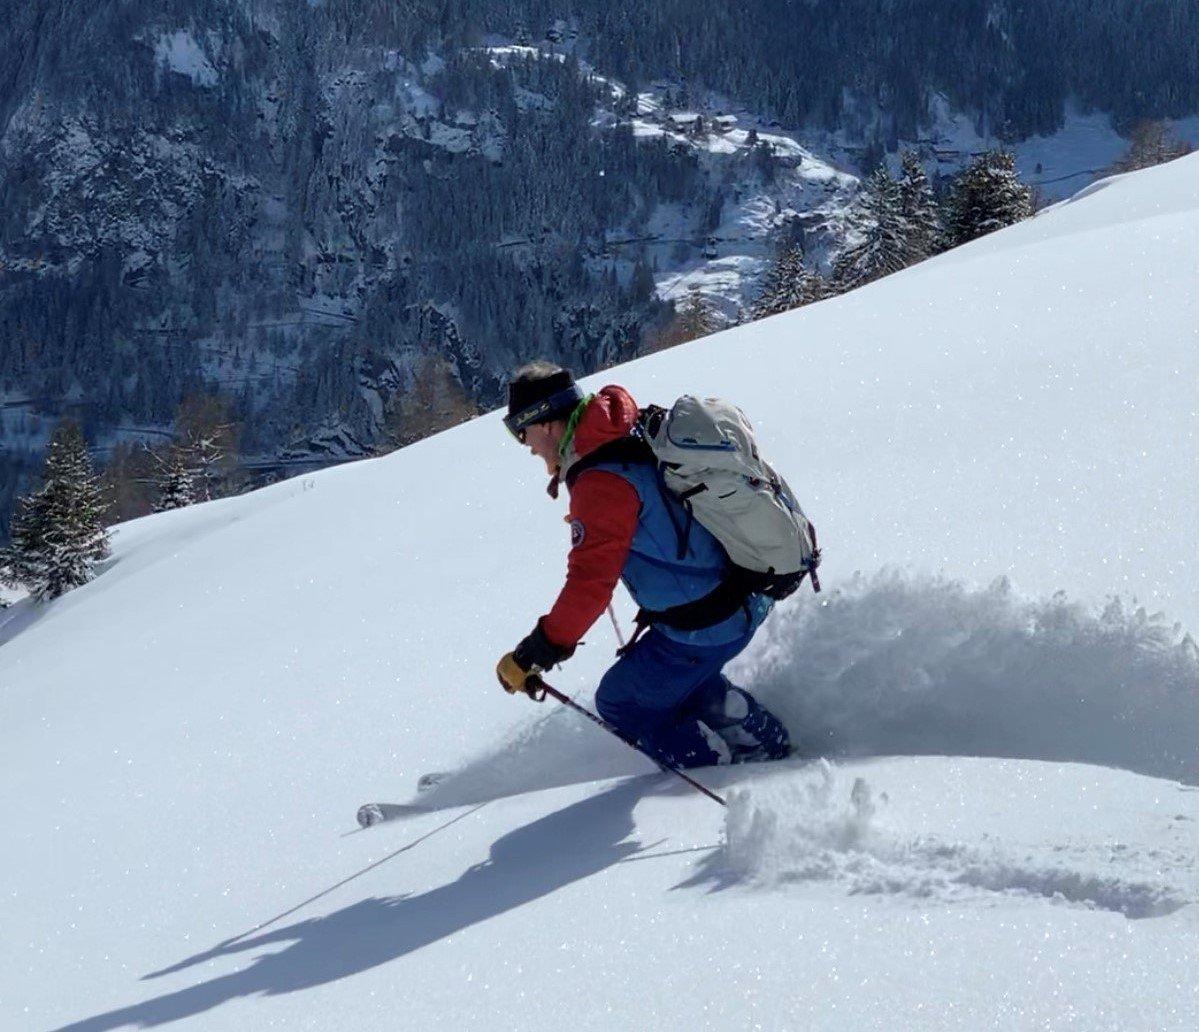 Ski touring introduction